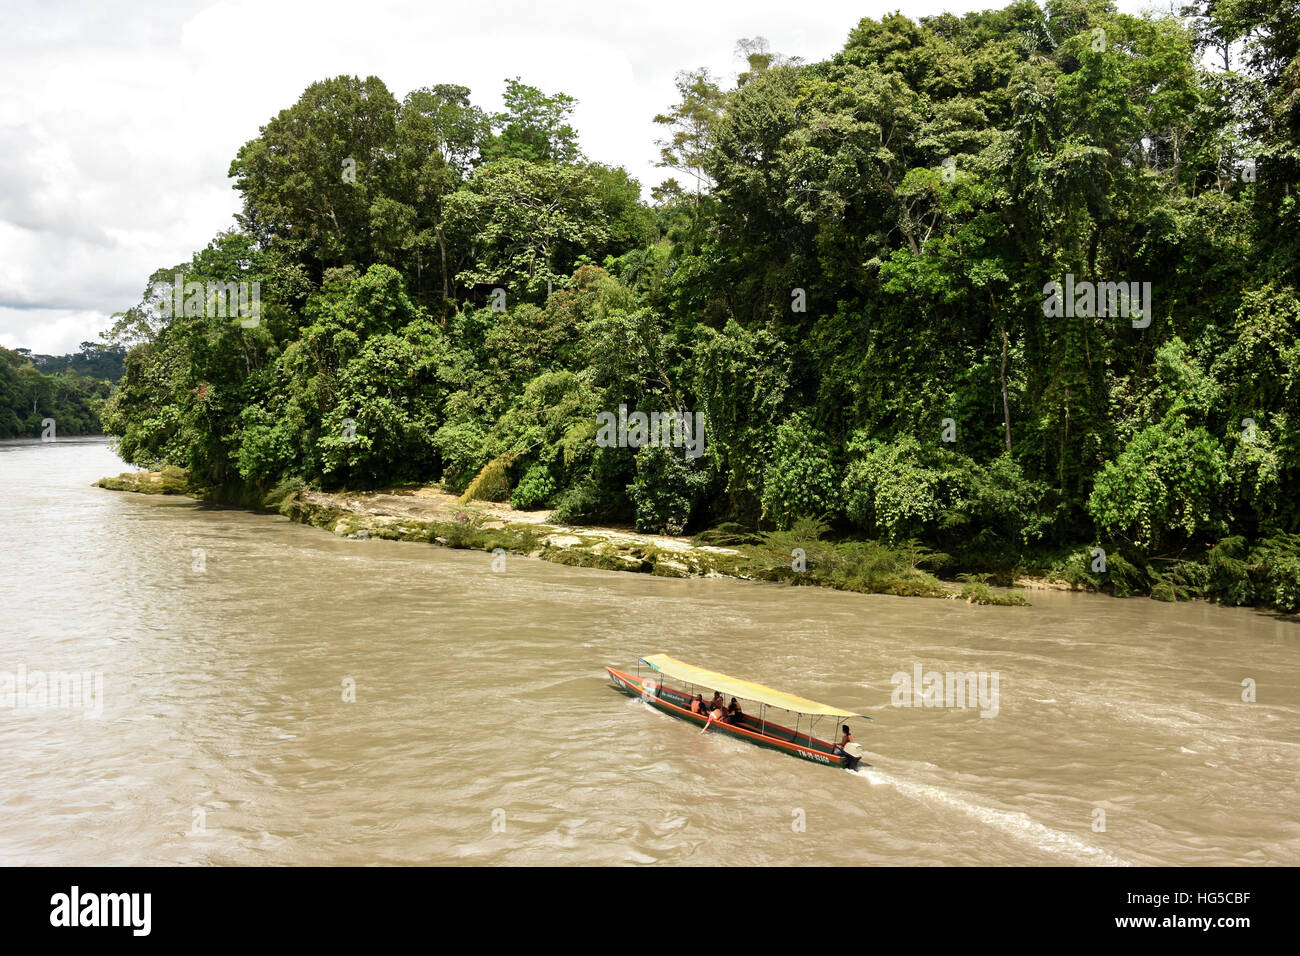 Misahualli in The Oriente, head of navigation on Rio Napo (Amazon), Ecuador, South America - Stock Image